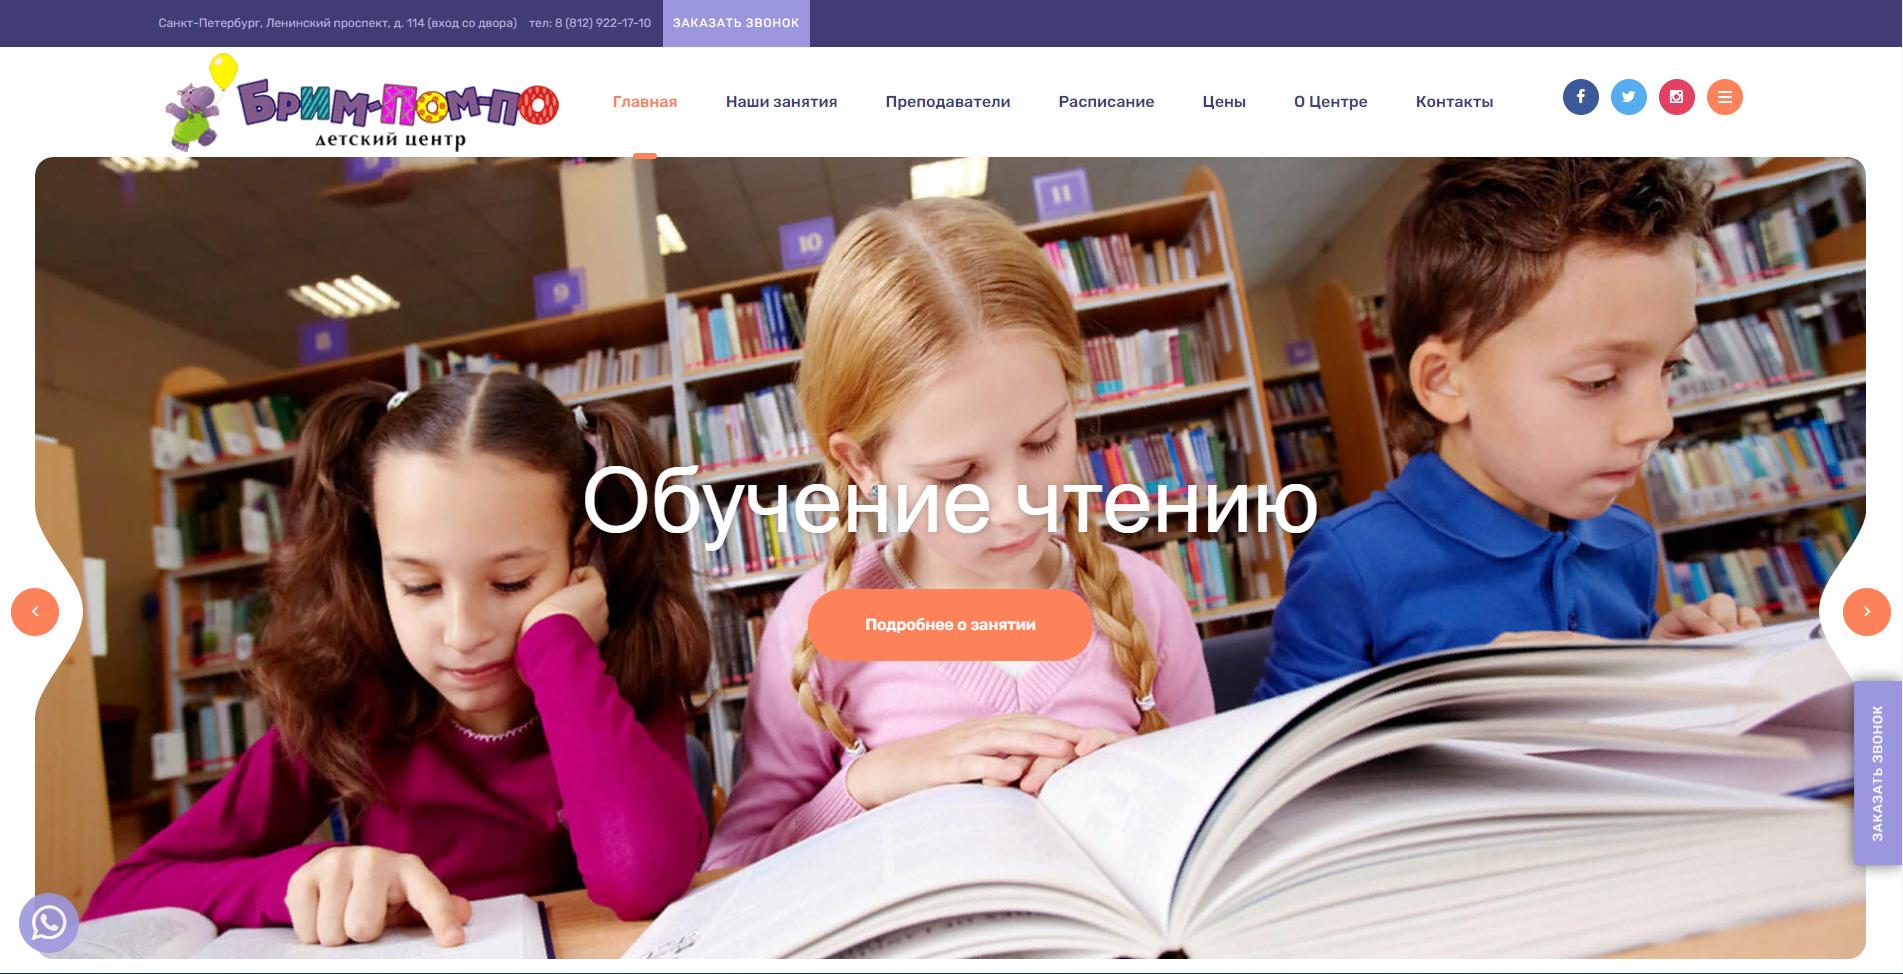 Детский центр Брим Пом По